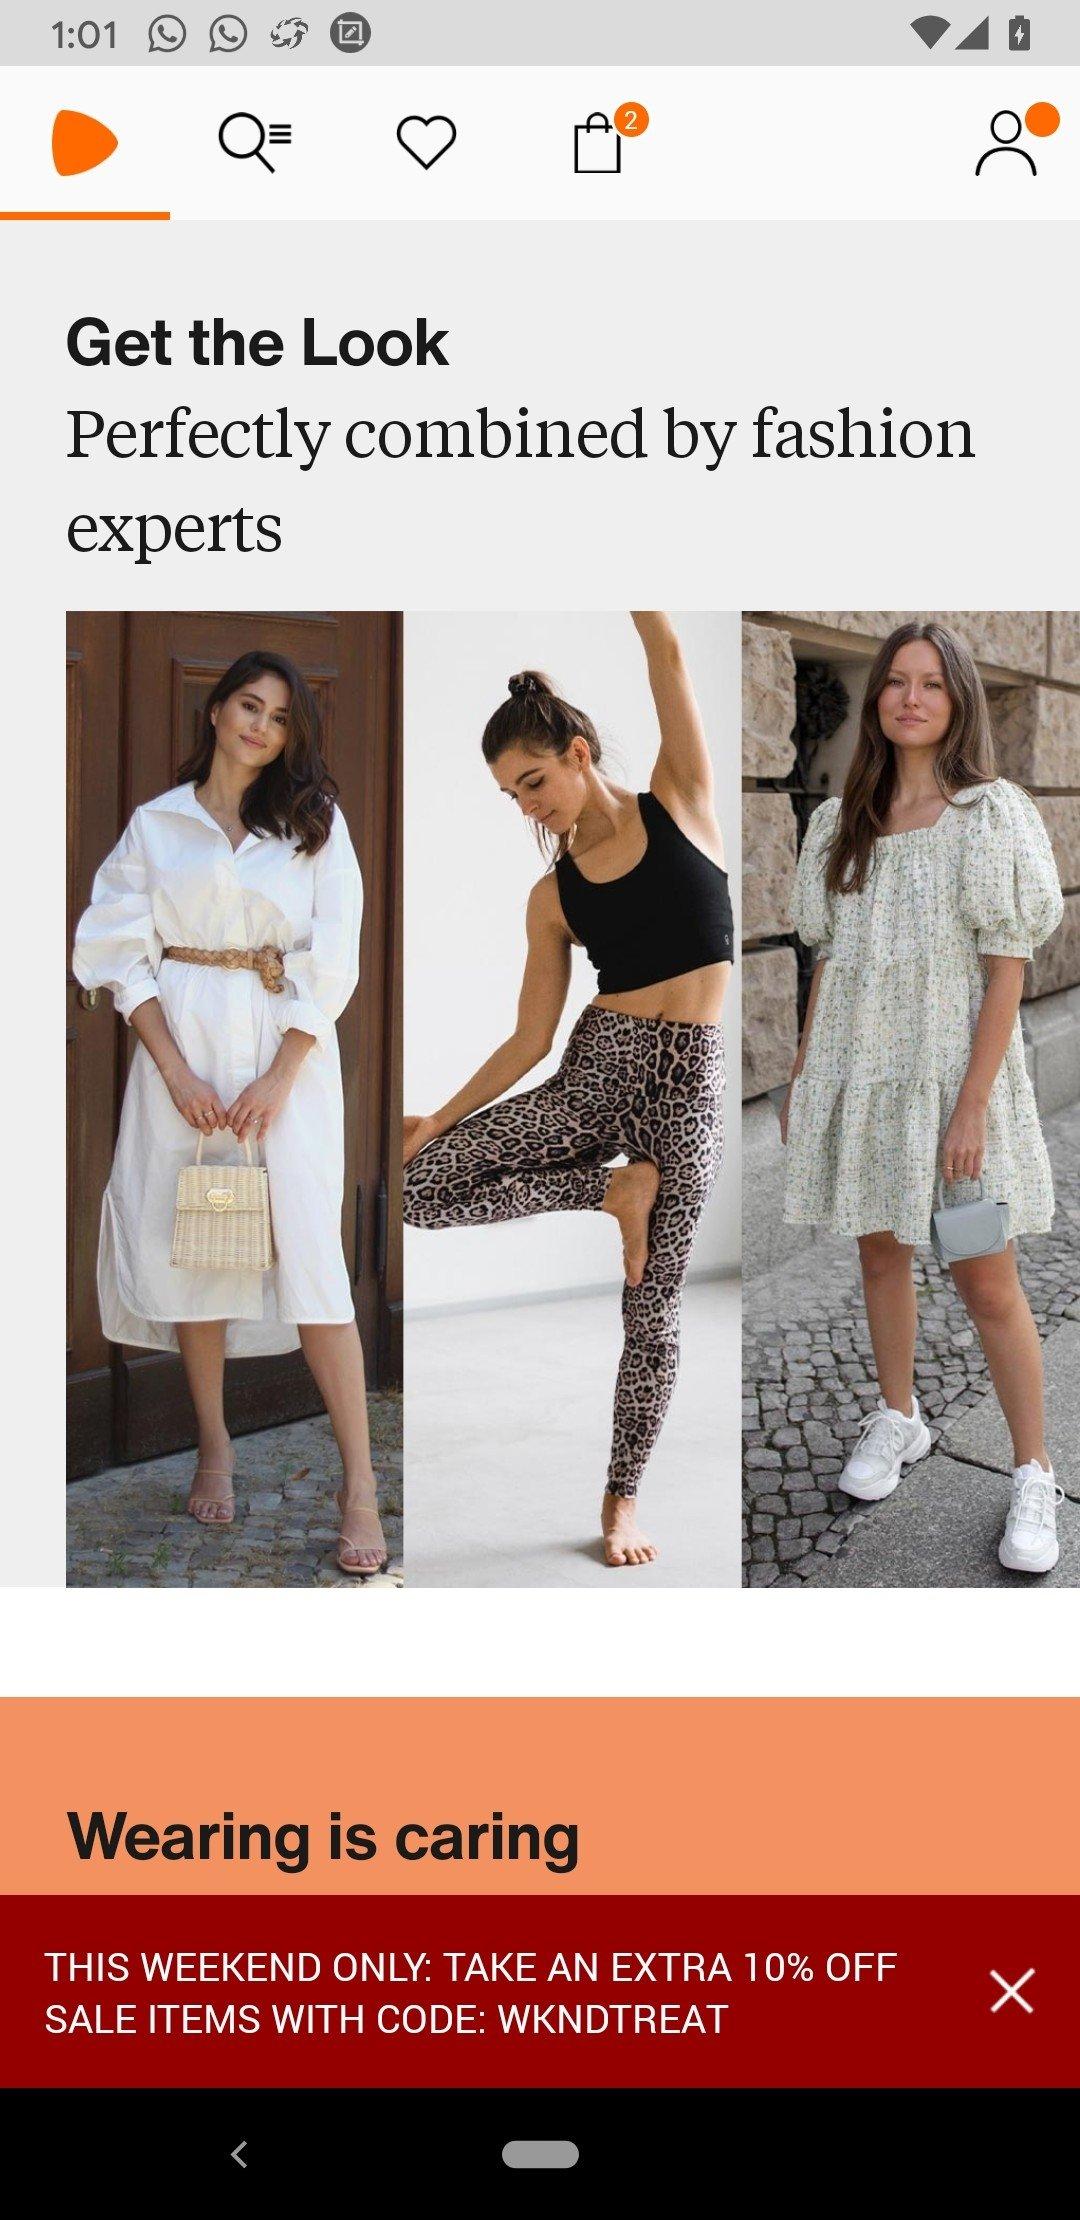 Zalando - Shopping & Fashion Android image 7